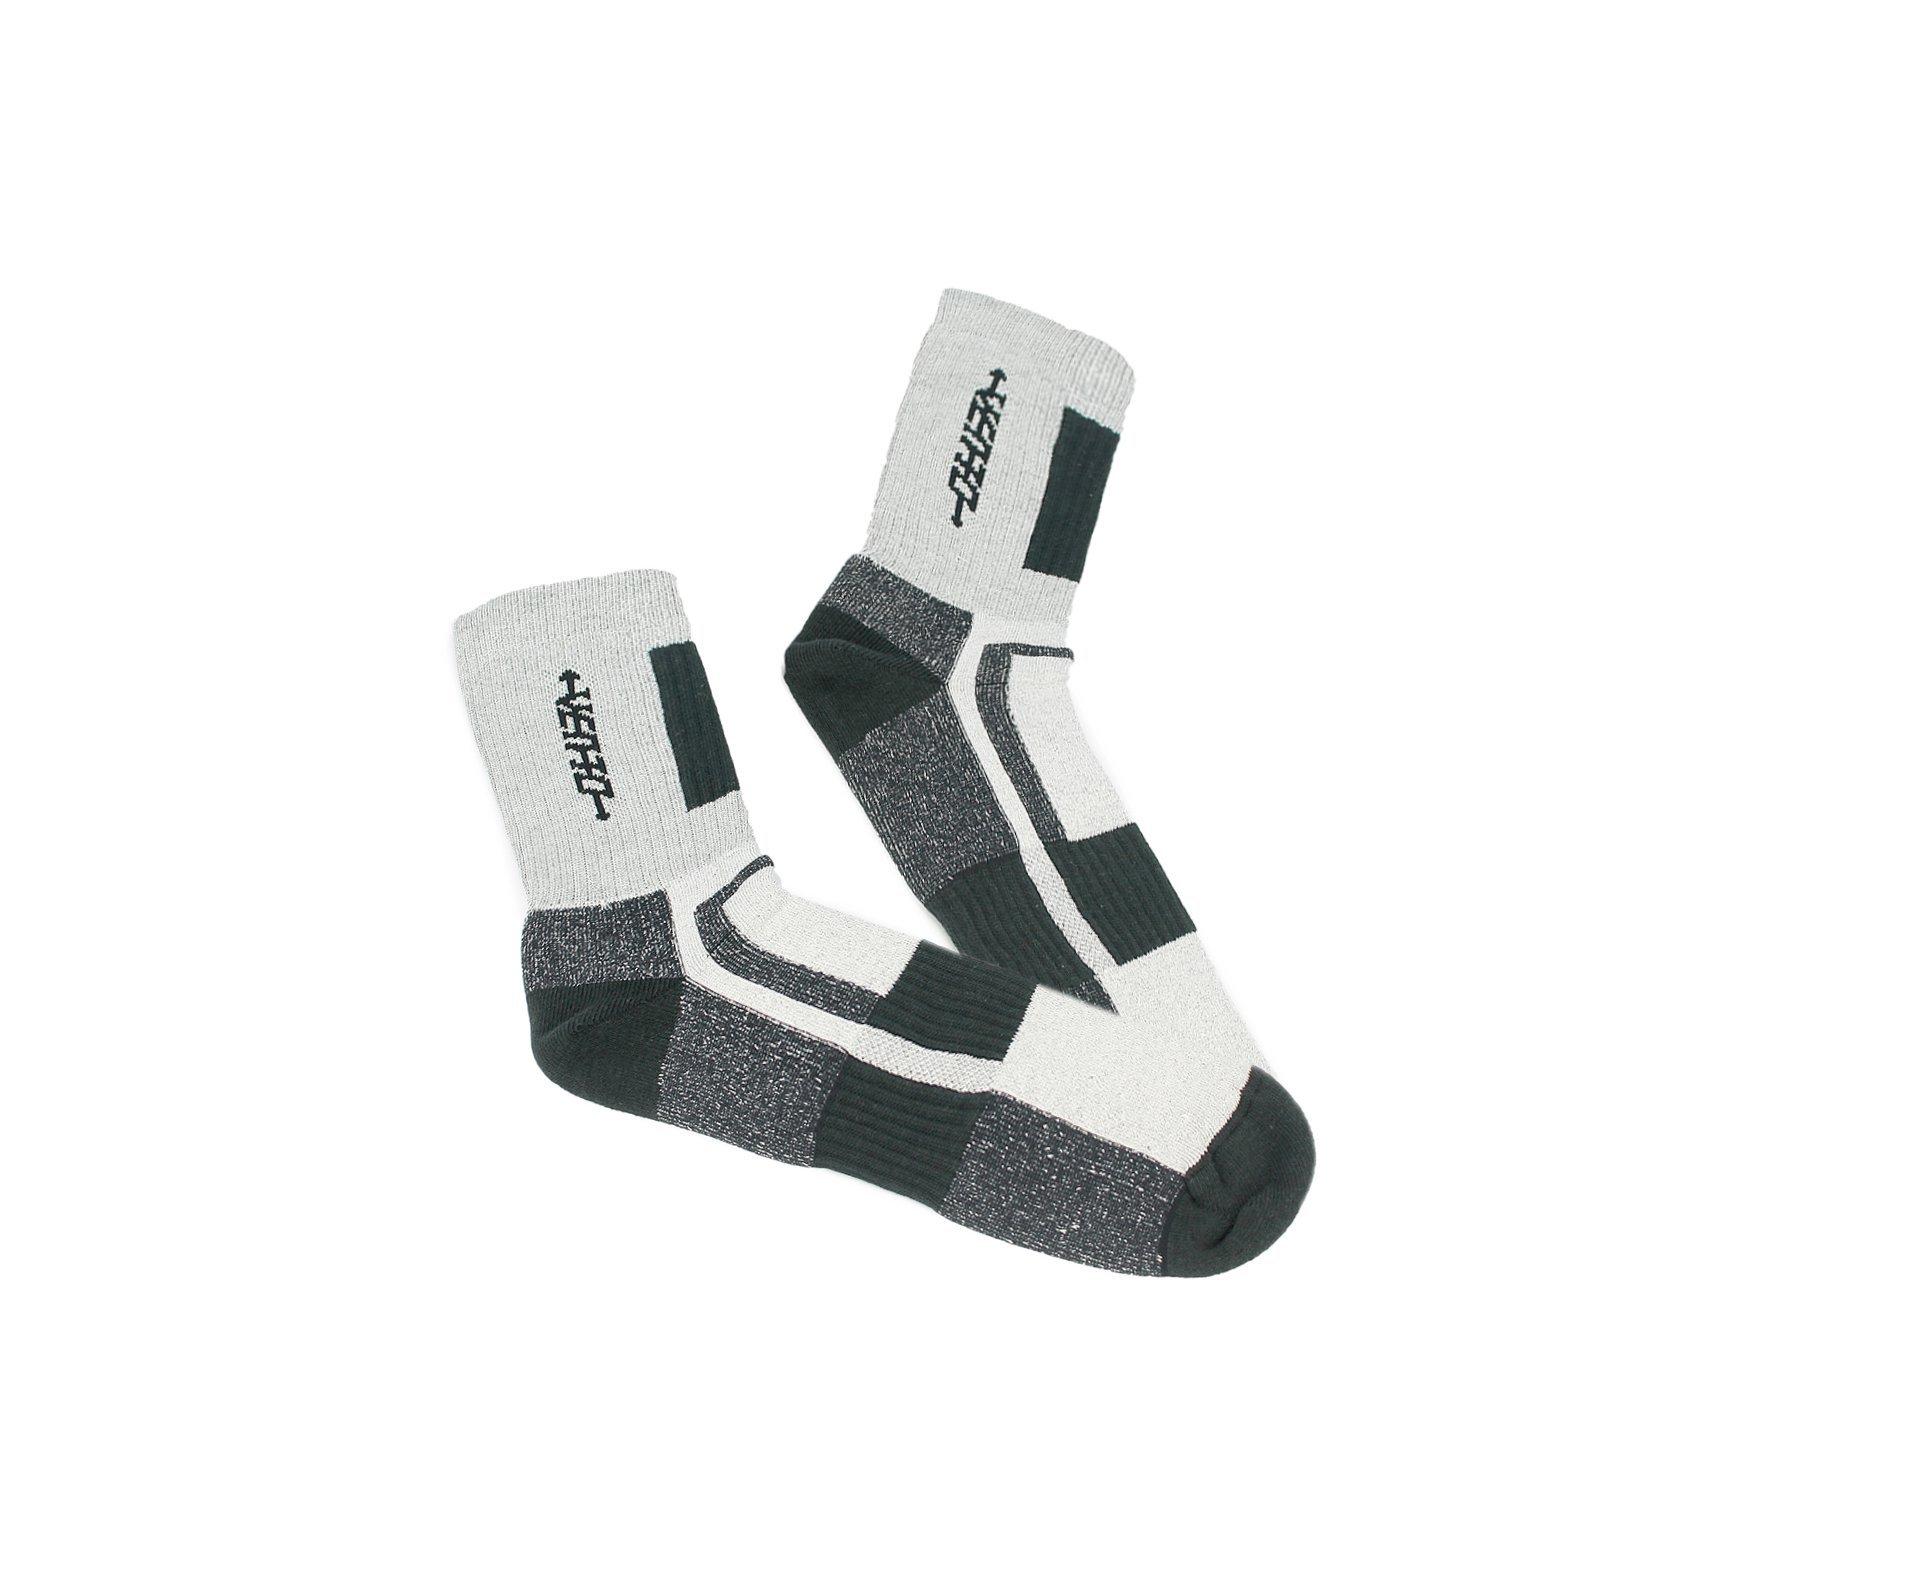 Meia Tecnica Vento Coolmax Cano Longo - Cinza/branco